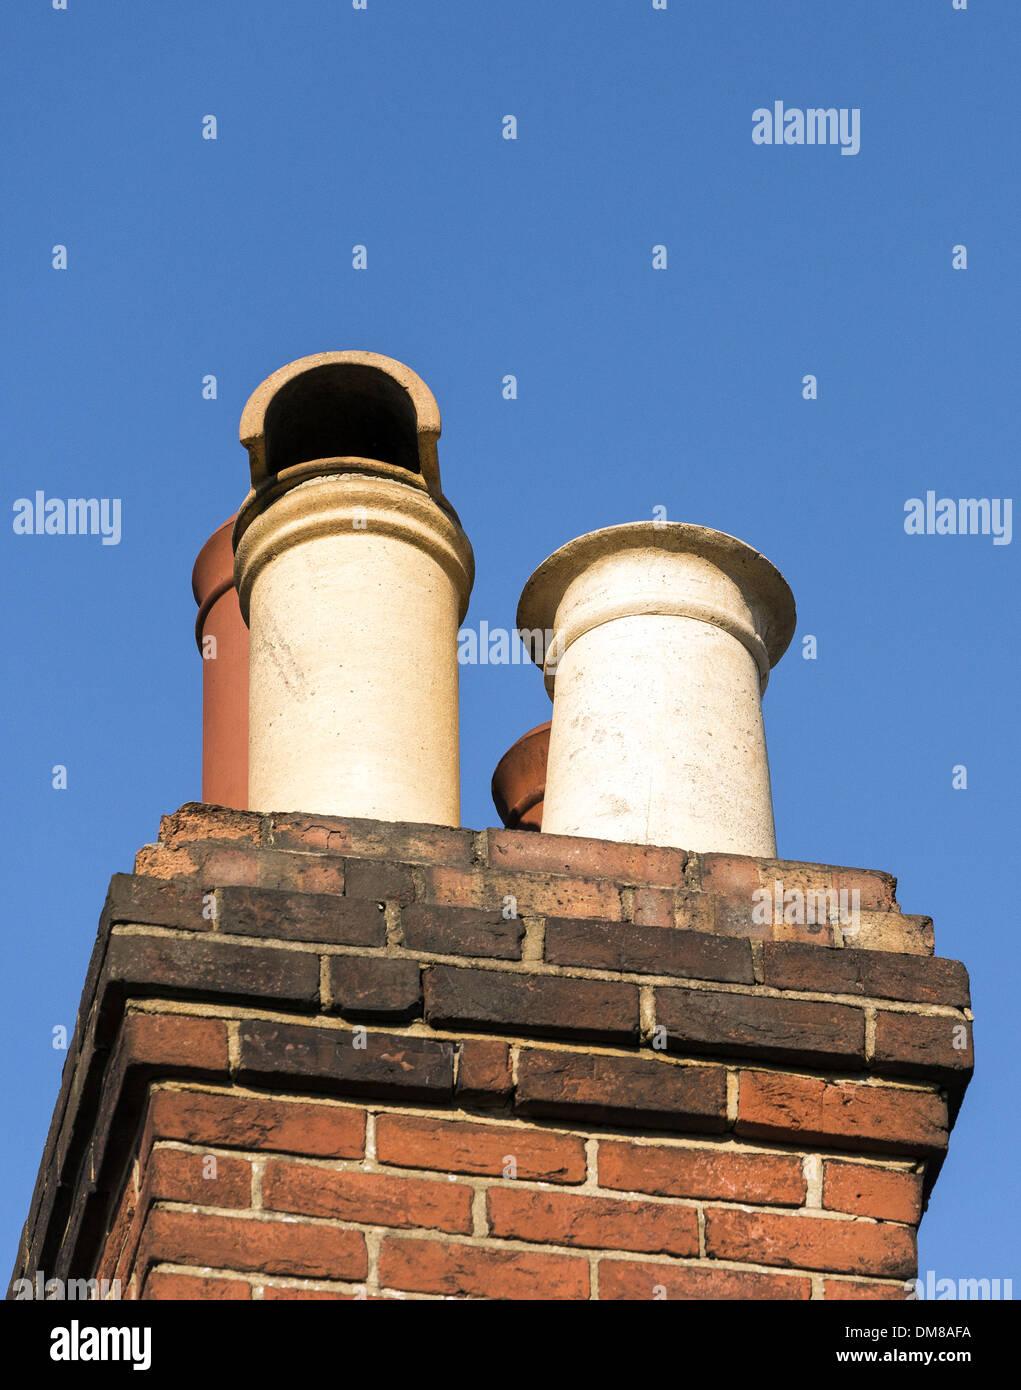 Chimney pots set against blue sky - Stock Image